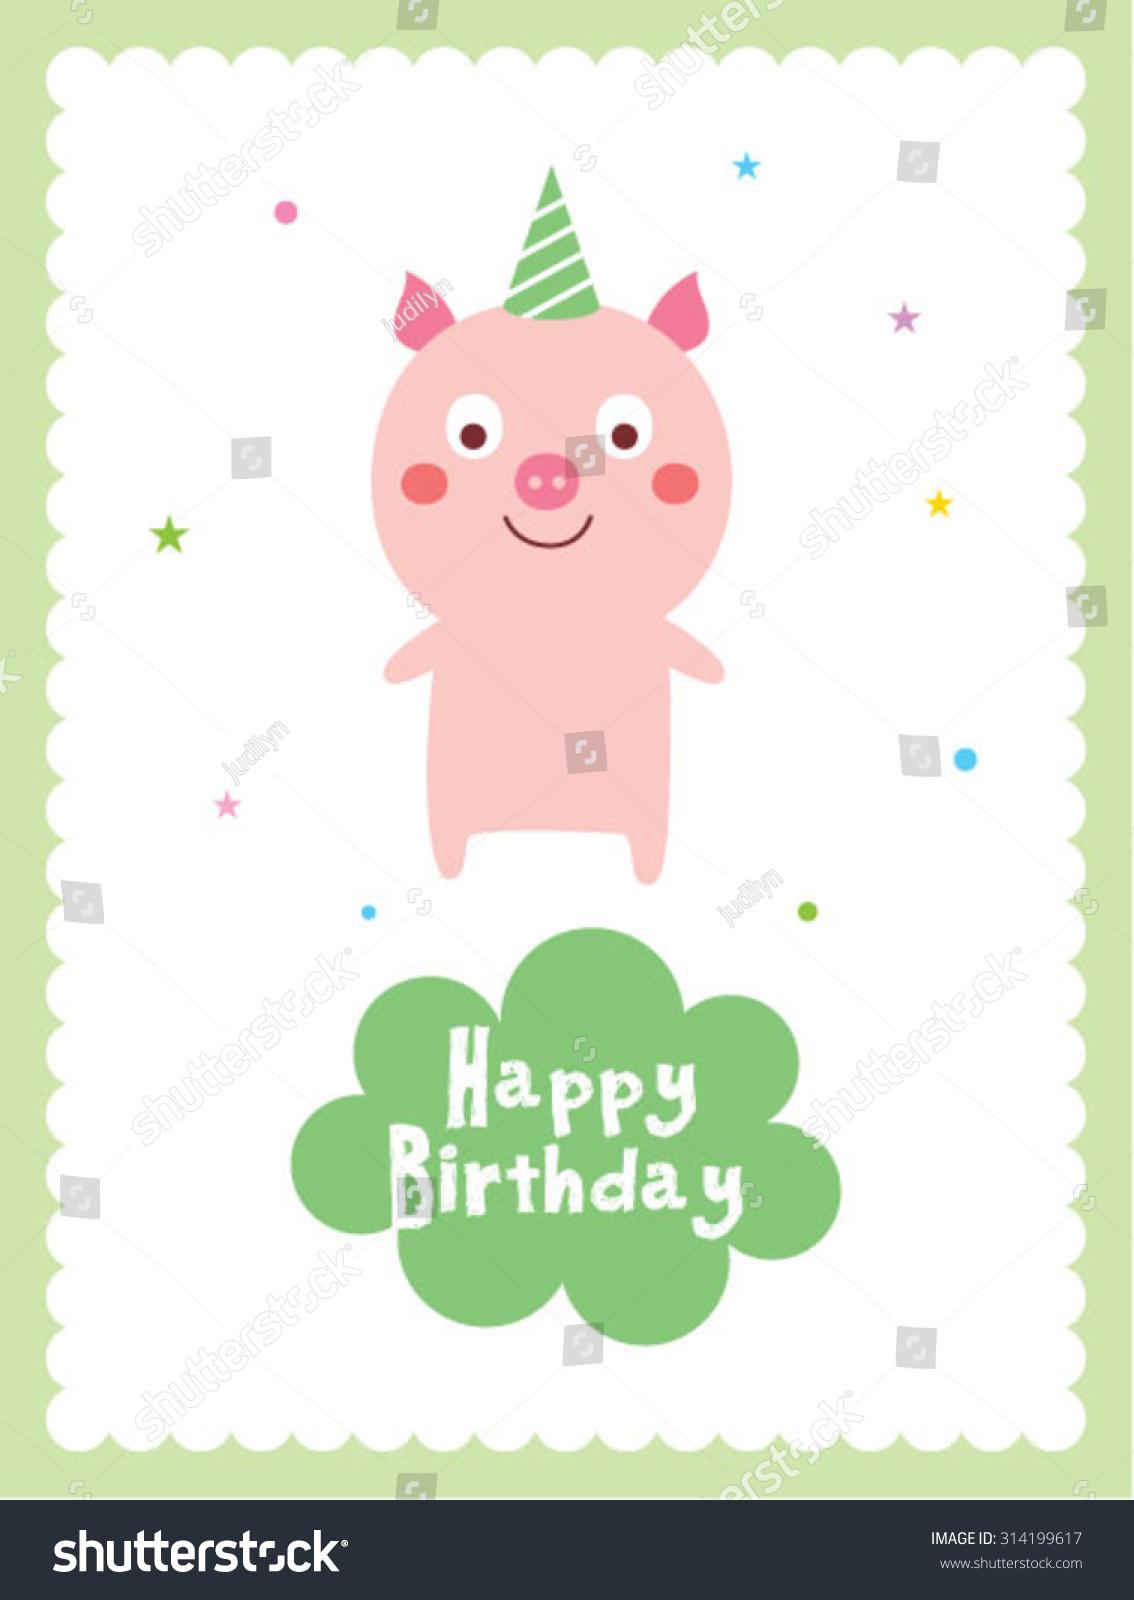 cute pig happy birthday card stock vector   shutterstock, Birthday card